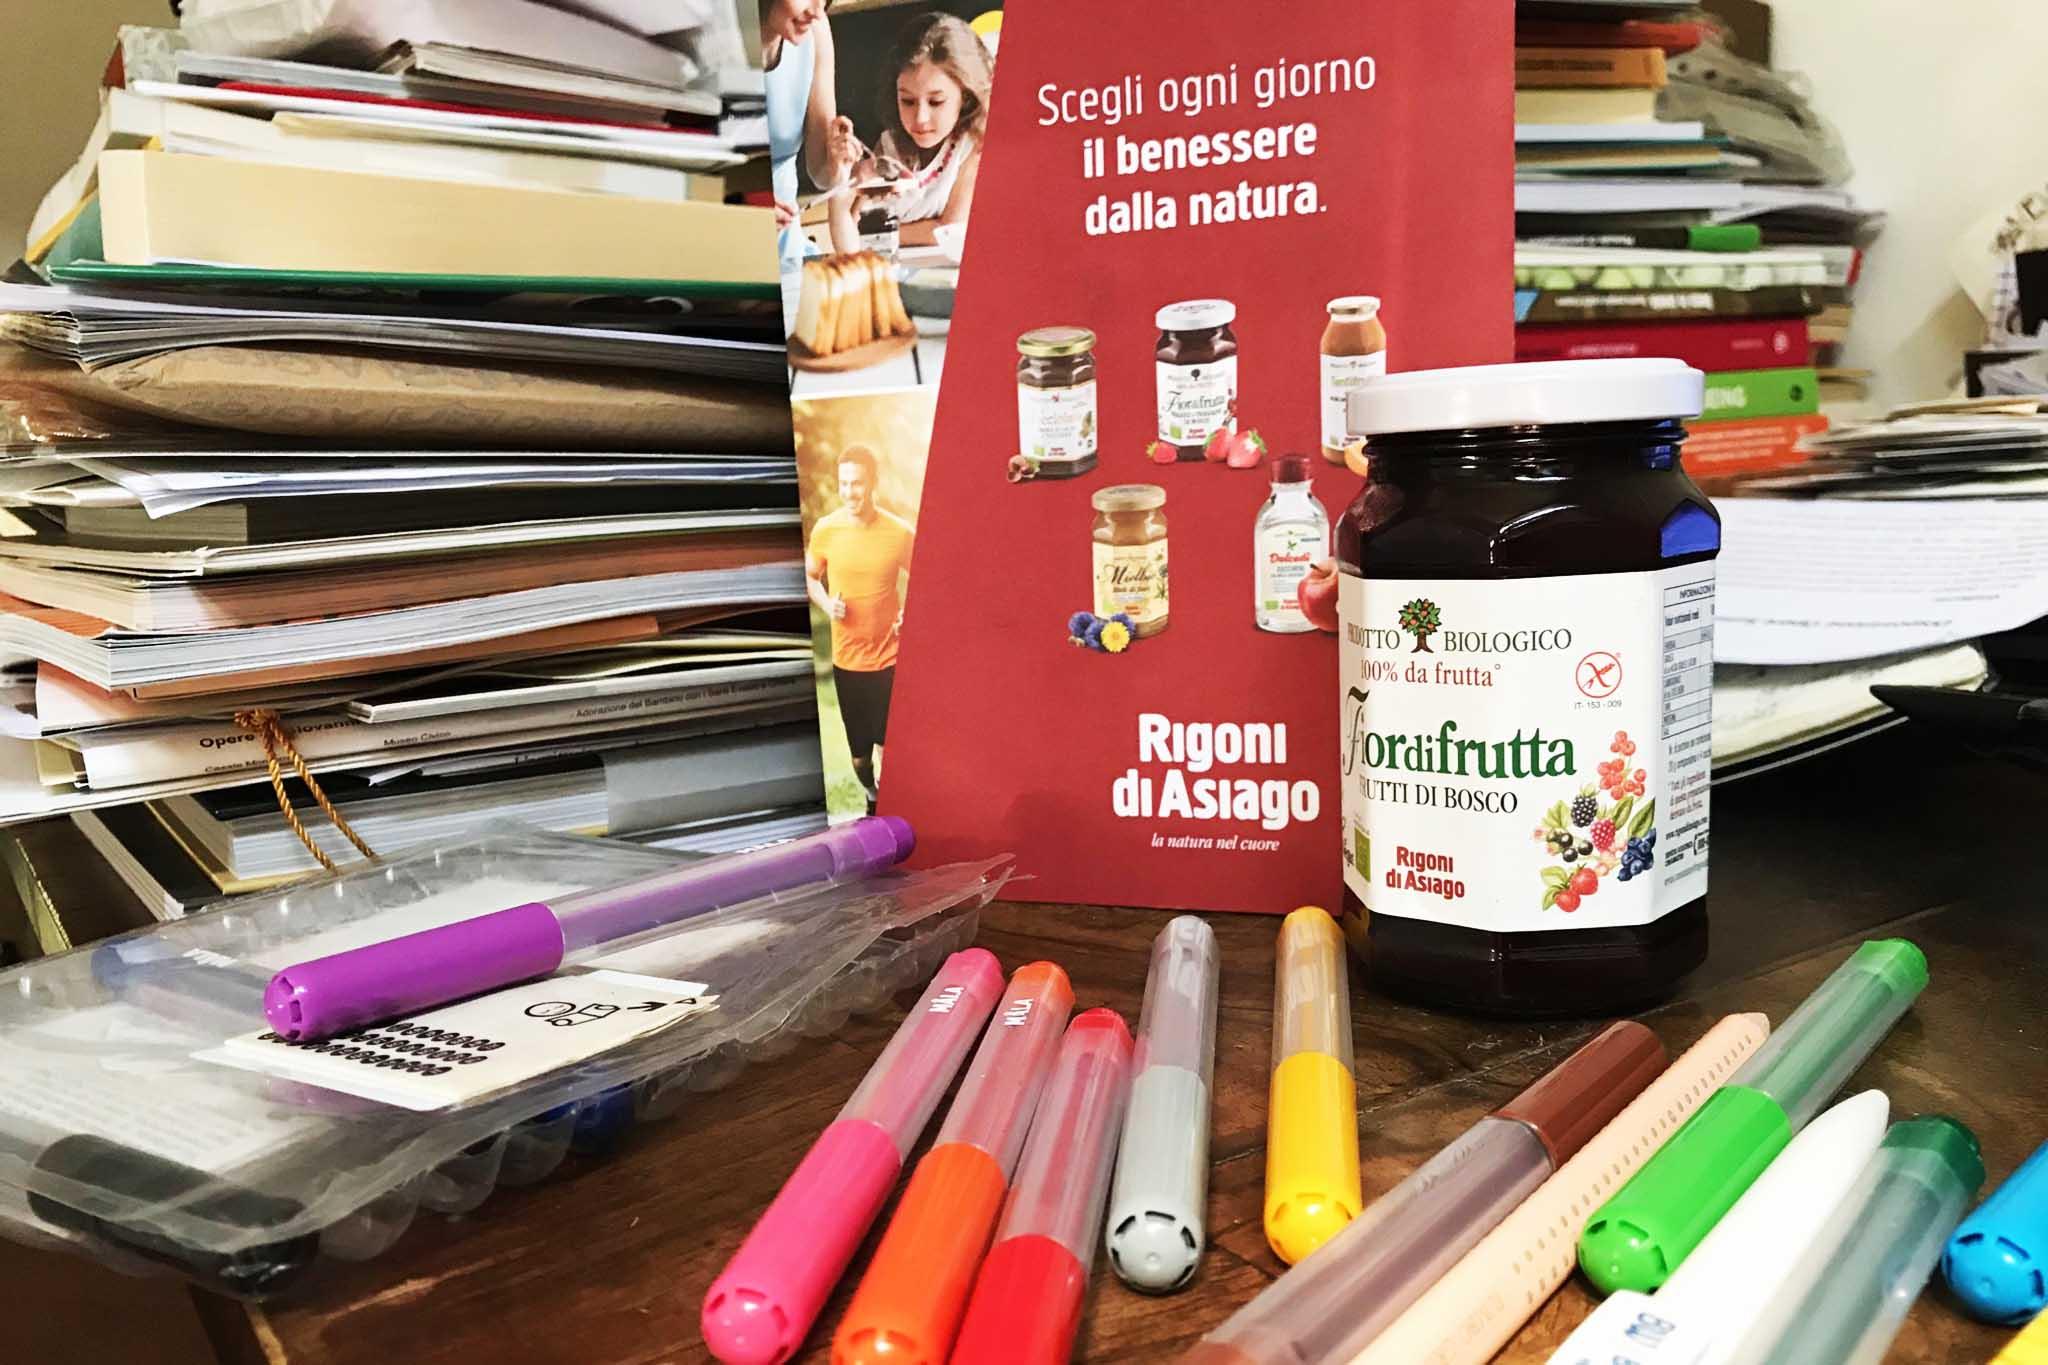 merenda Rigoni marmellata pennarelli